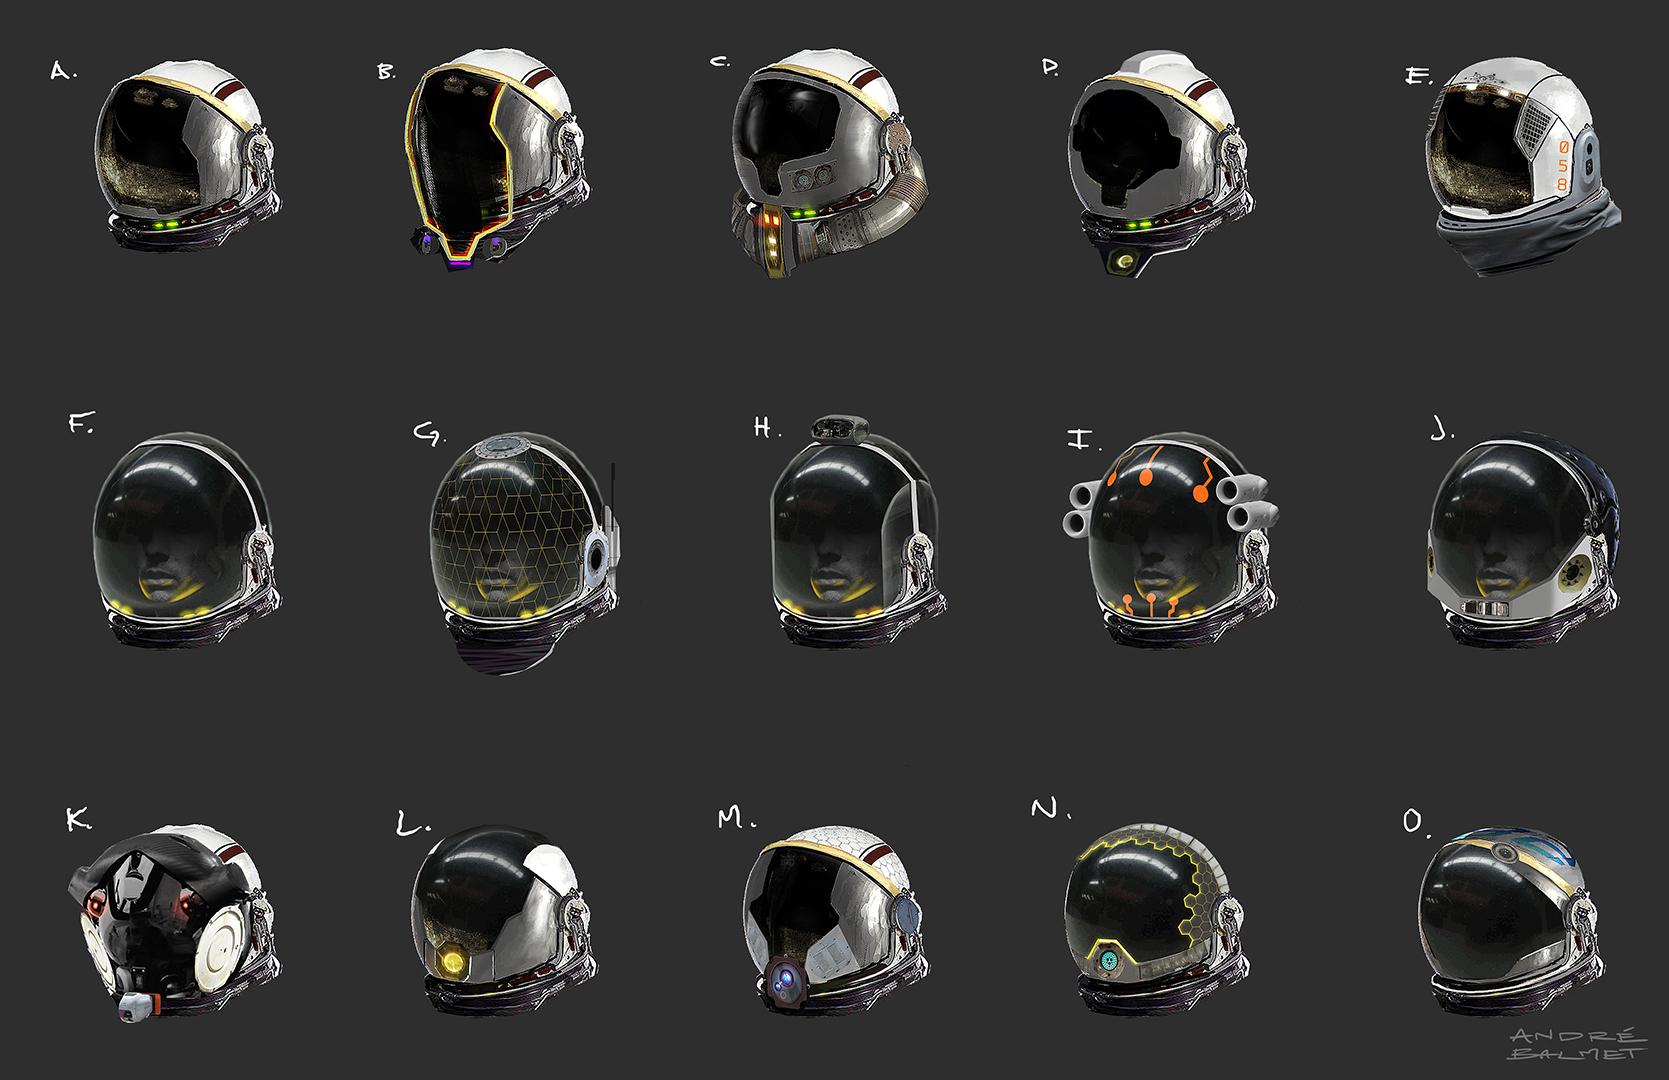 ABalmet_Helmets_01.jpg